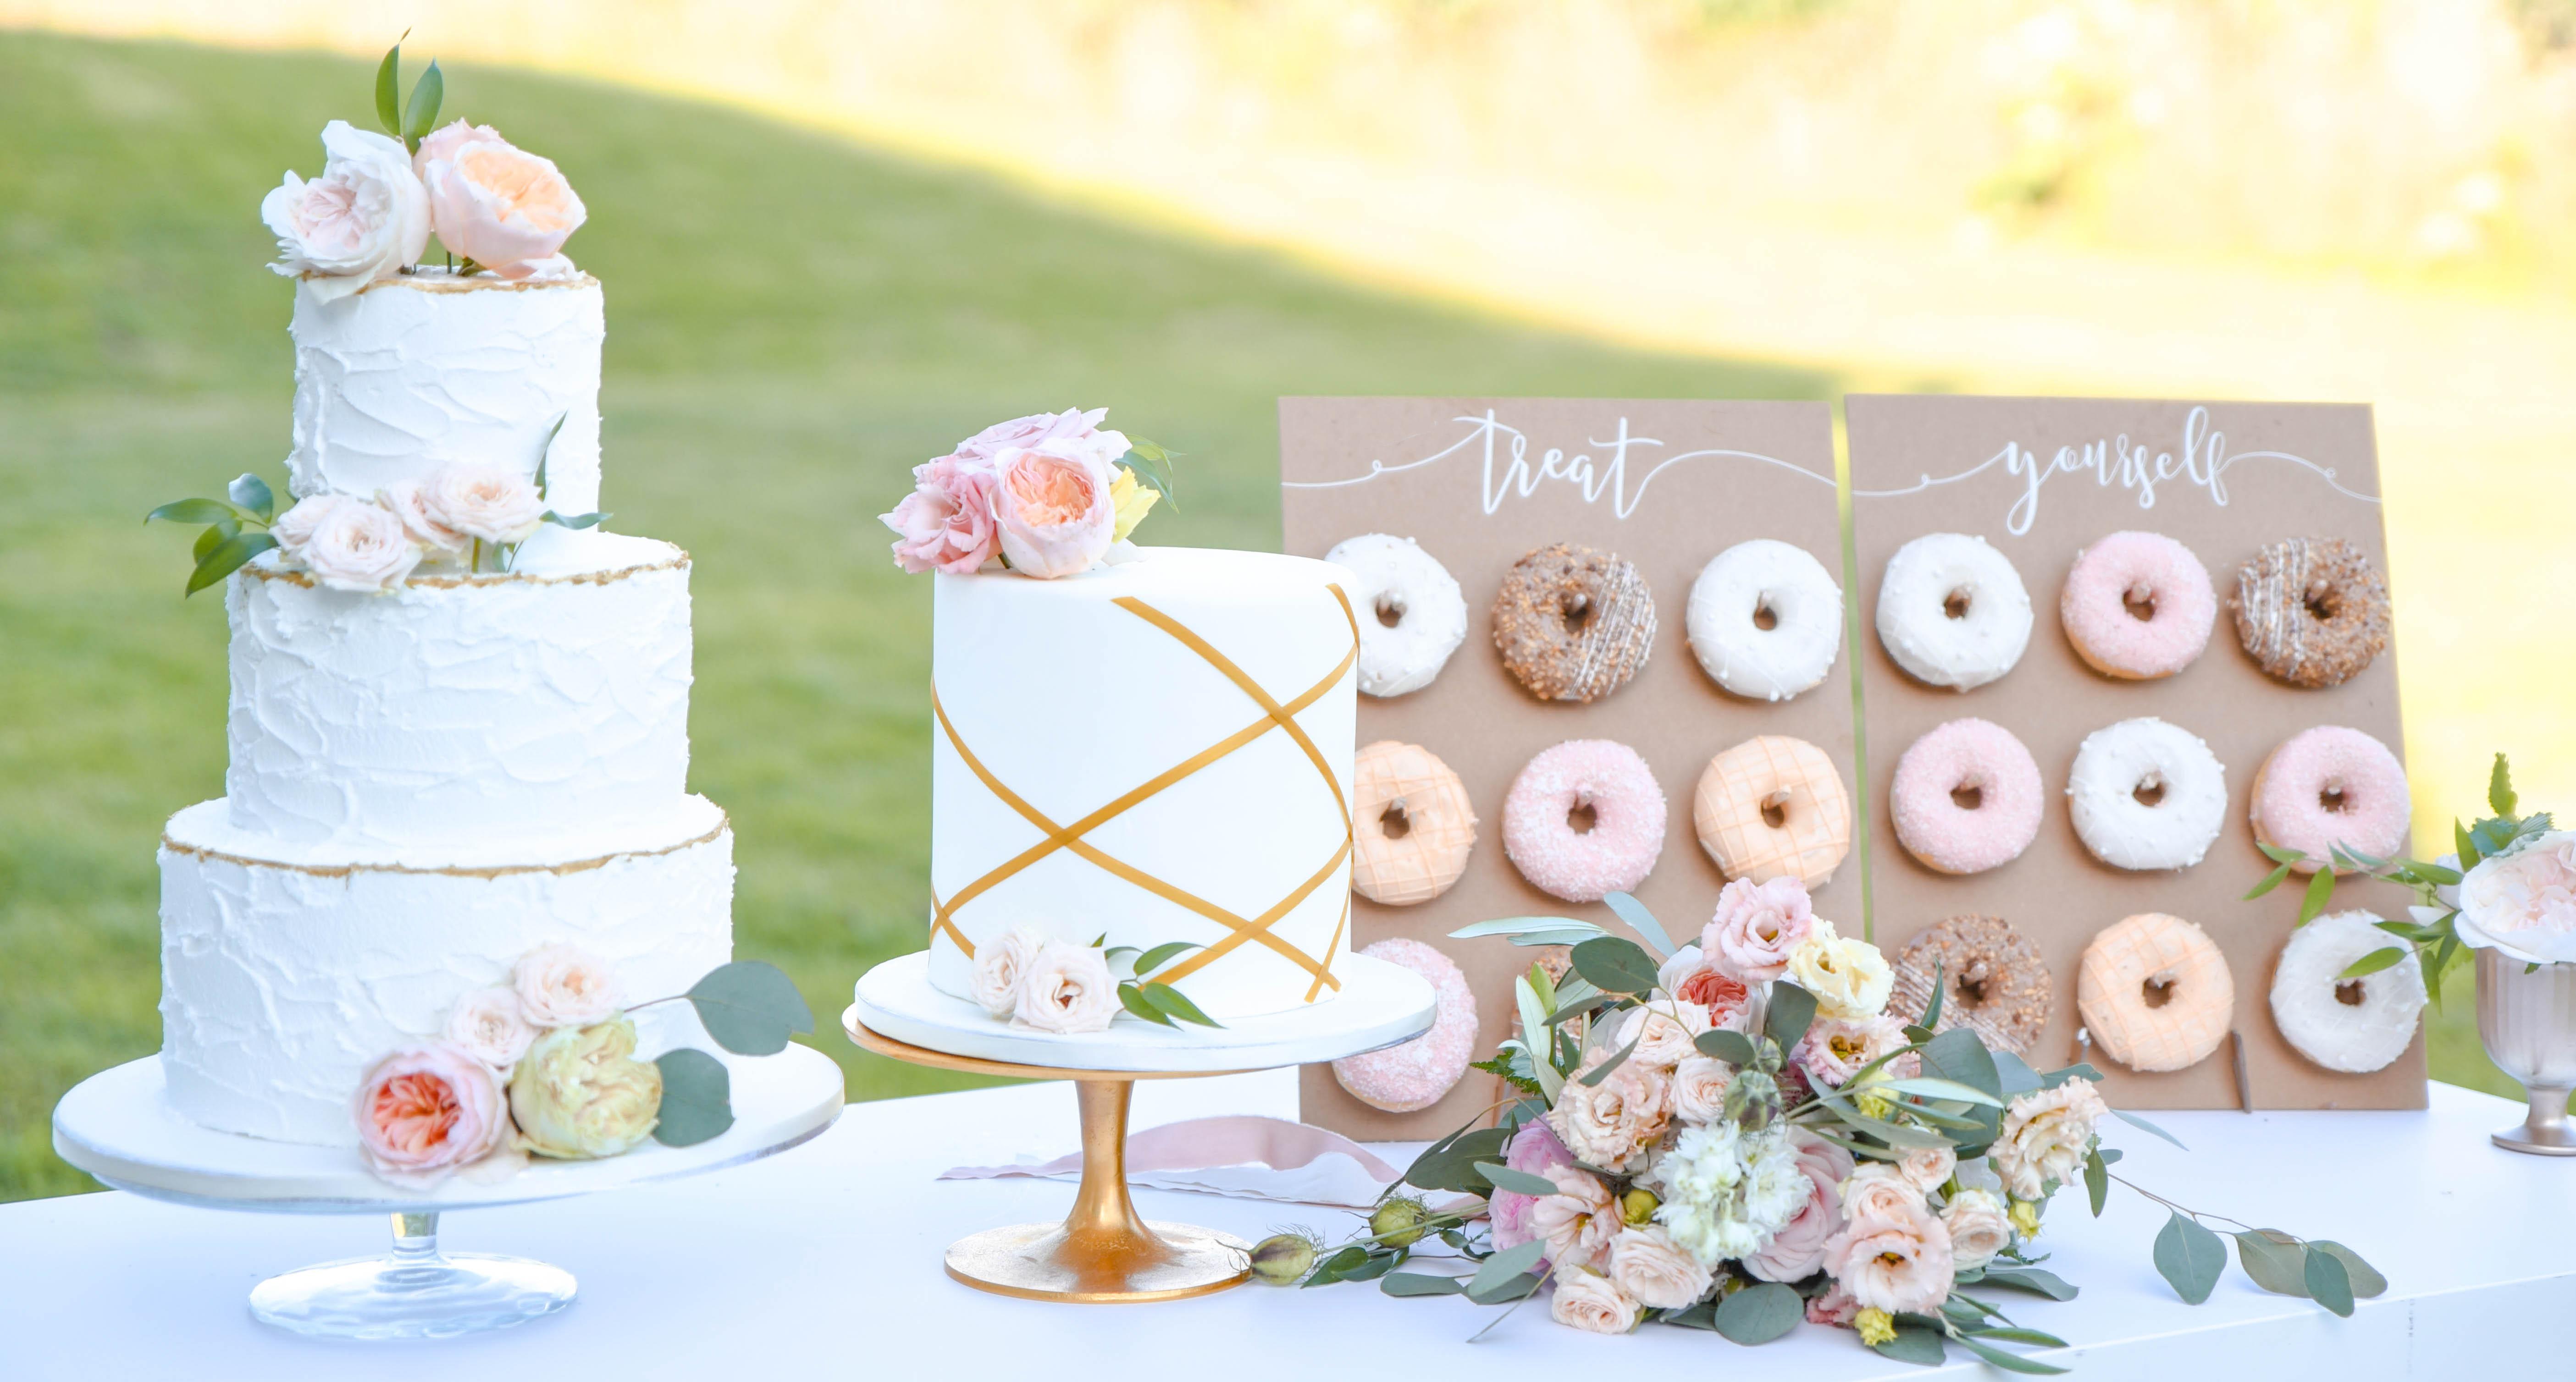 Sweet table op je bruiloft met donuts - By VT Photography